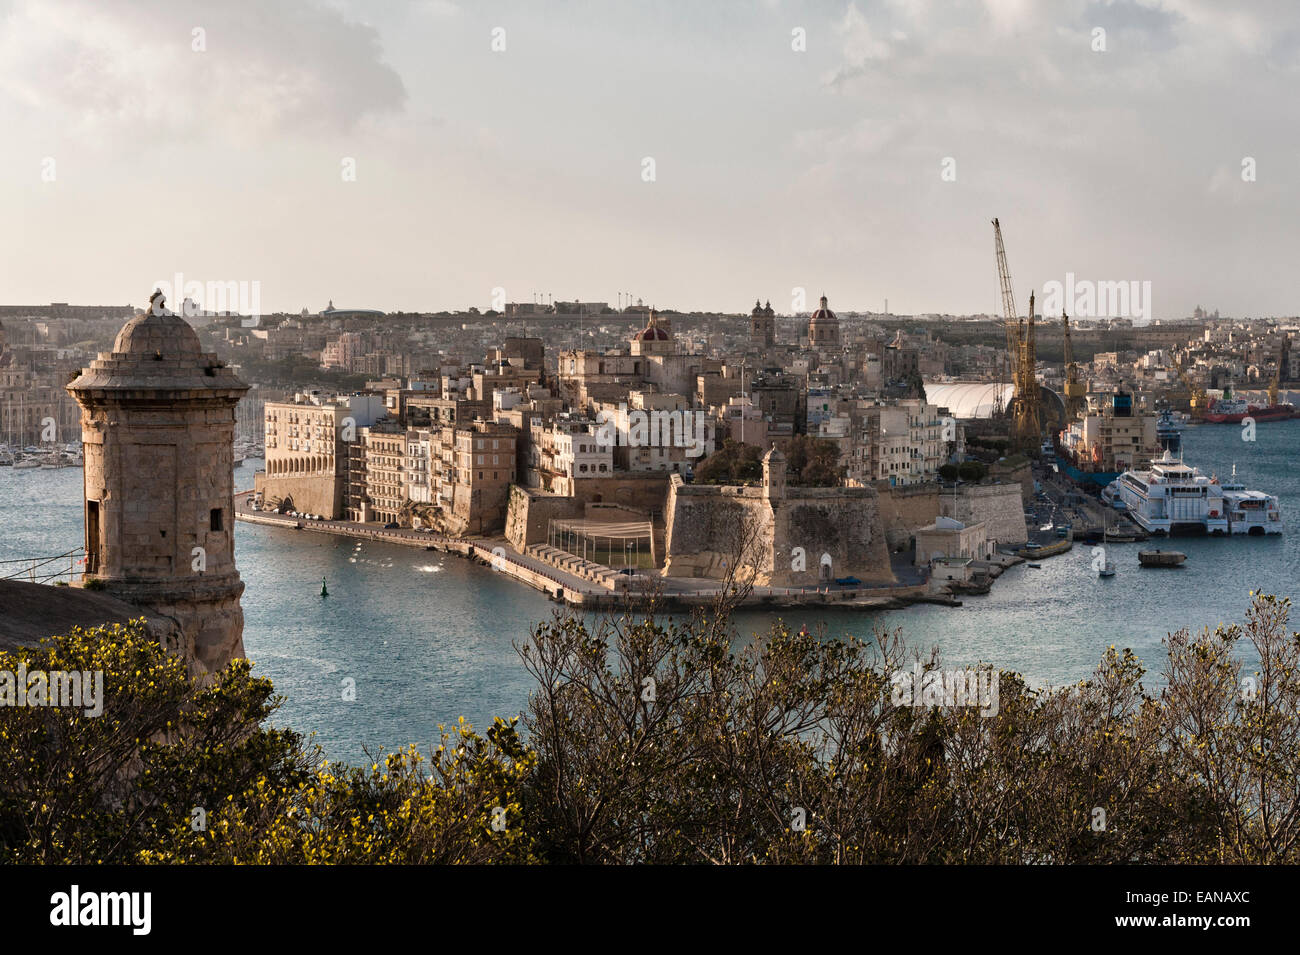 Senglea, Malta. Fort Saint Michael and the Grand Harbour seen from the Upper Barrakka Gardens in Valletta - Stock Image